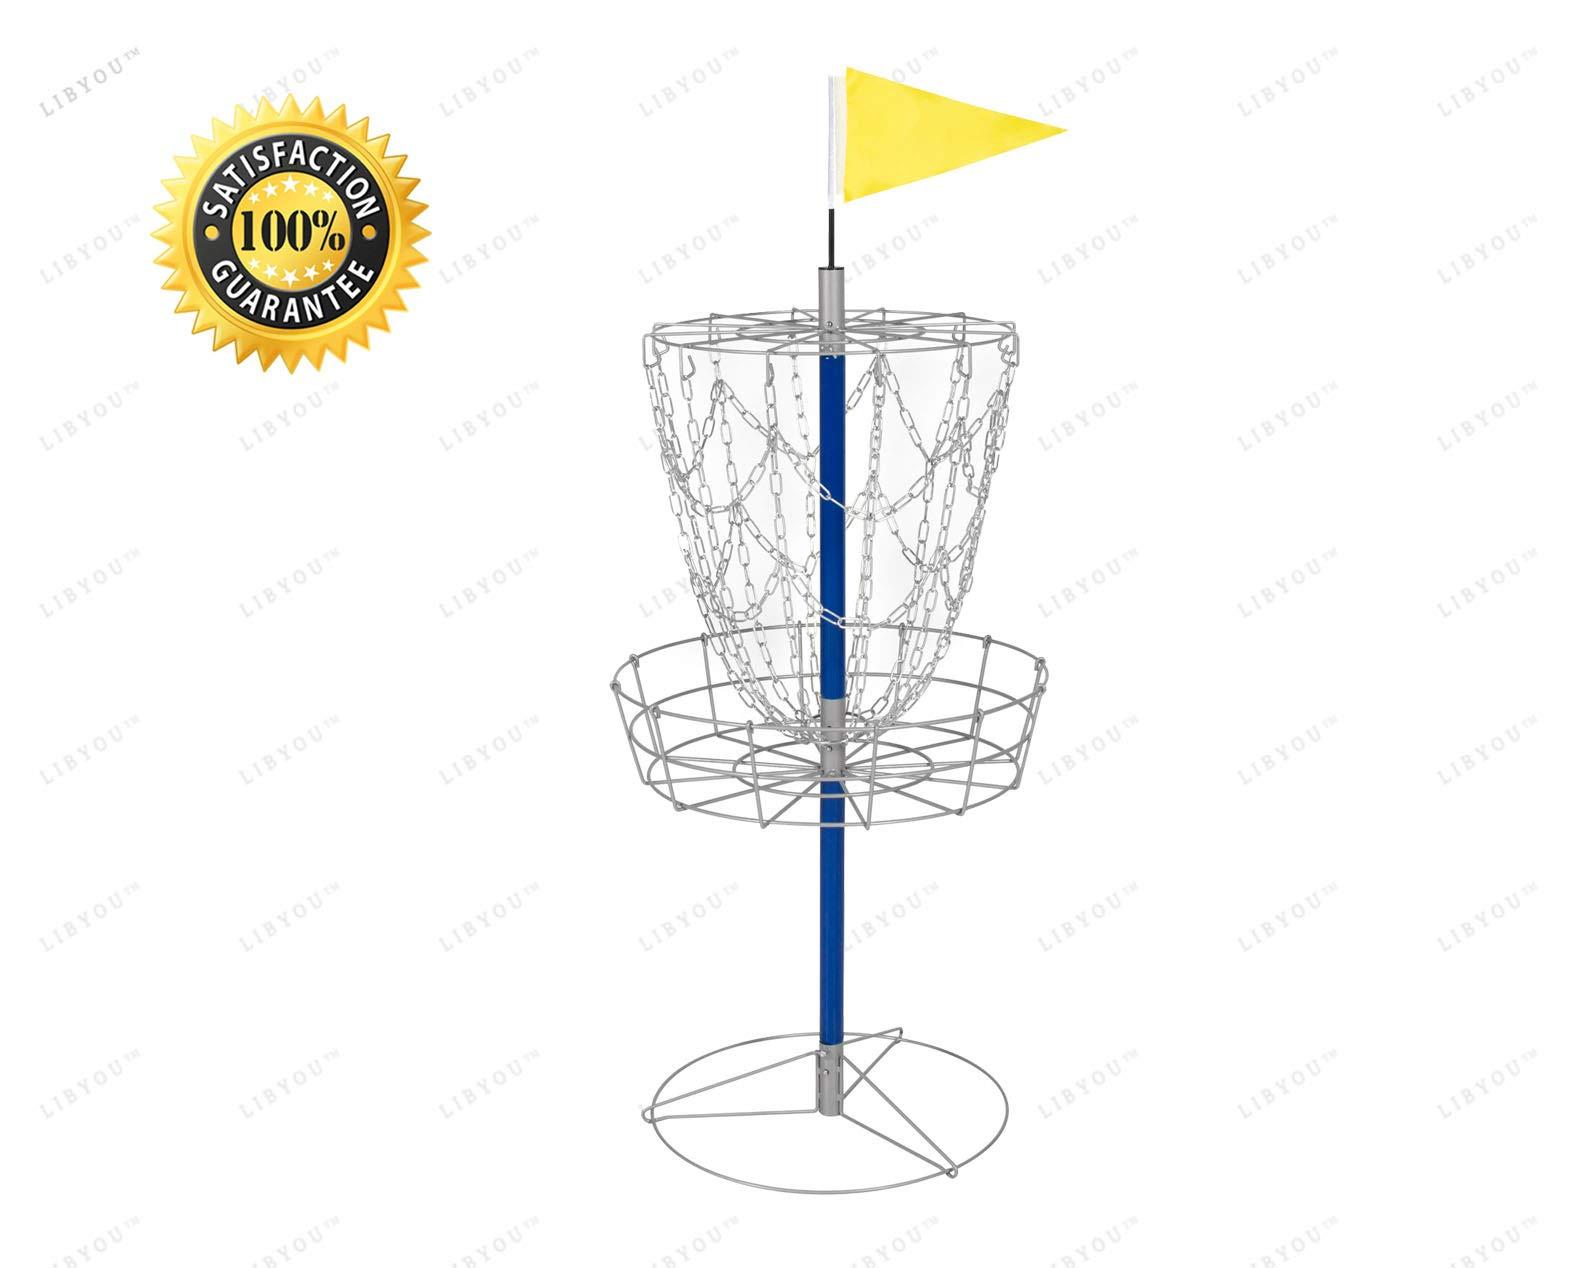 COLIBROX__Portable disc Golf Basket,disc Golf Basket,Golf Basket Chains,disc Golf Basket Full Size,disc Golf Basket with Legs by COLIBROX